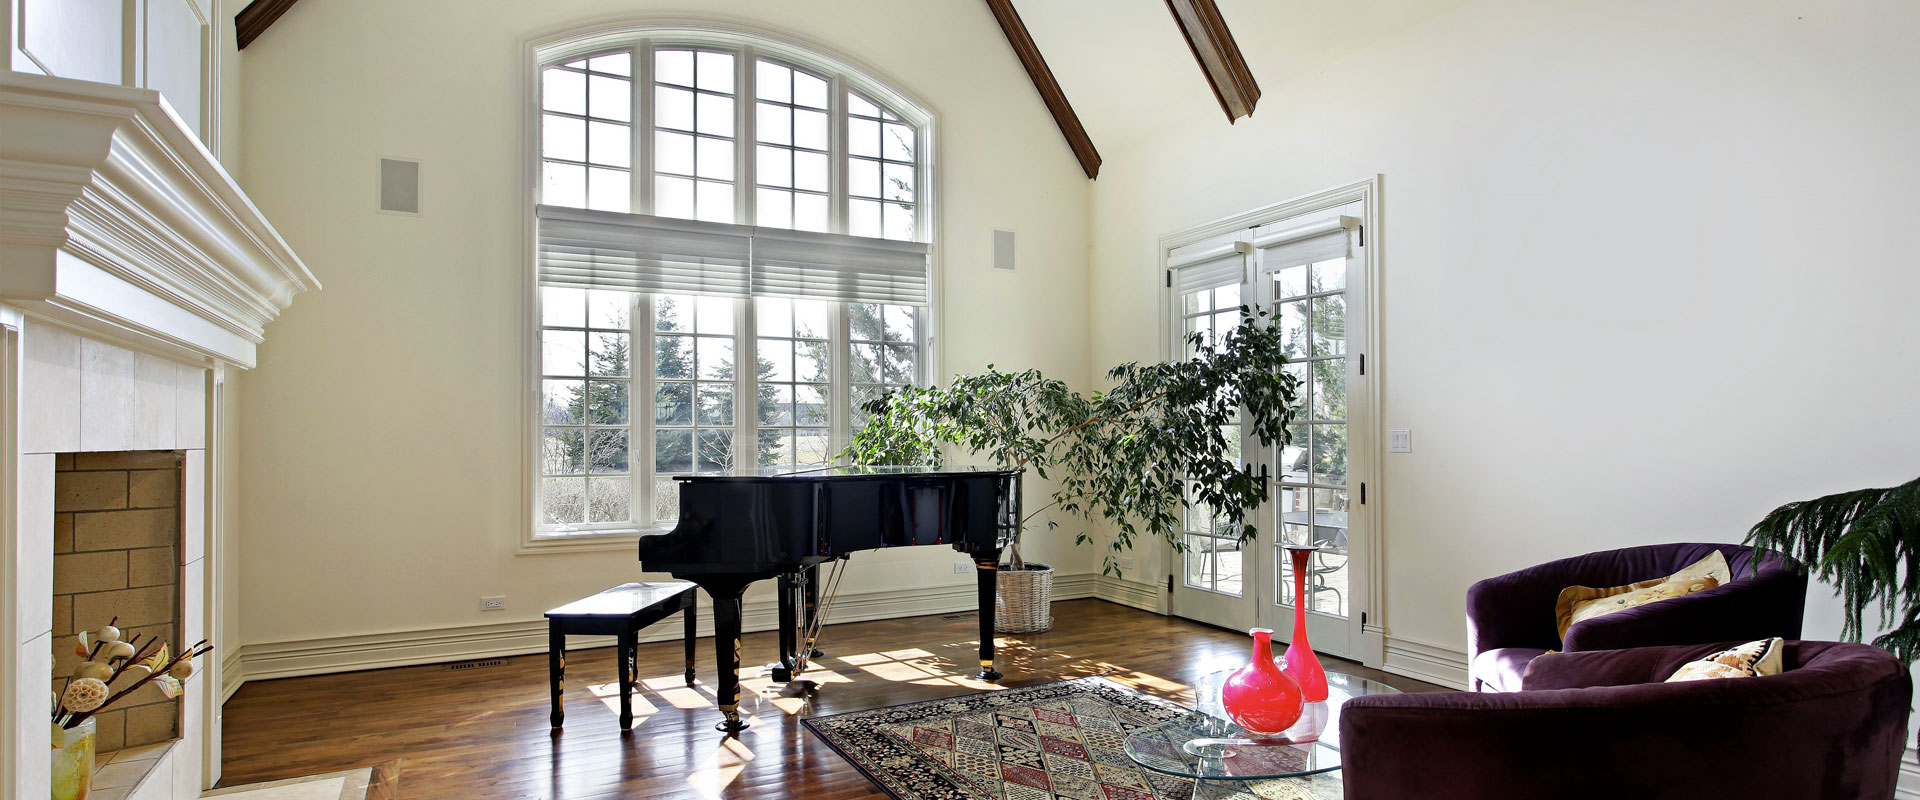 Salón con perfil de ventana LightTek